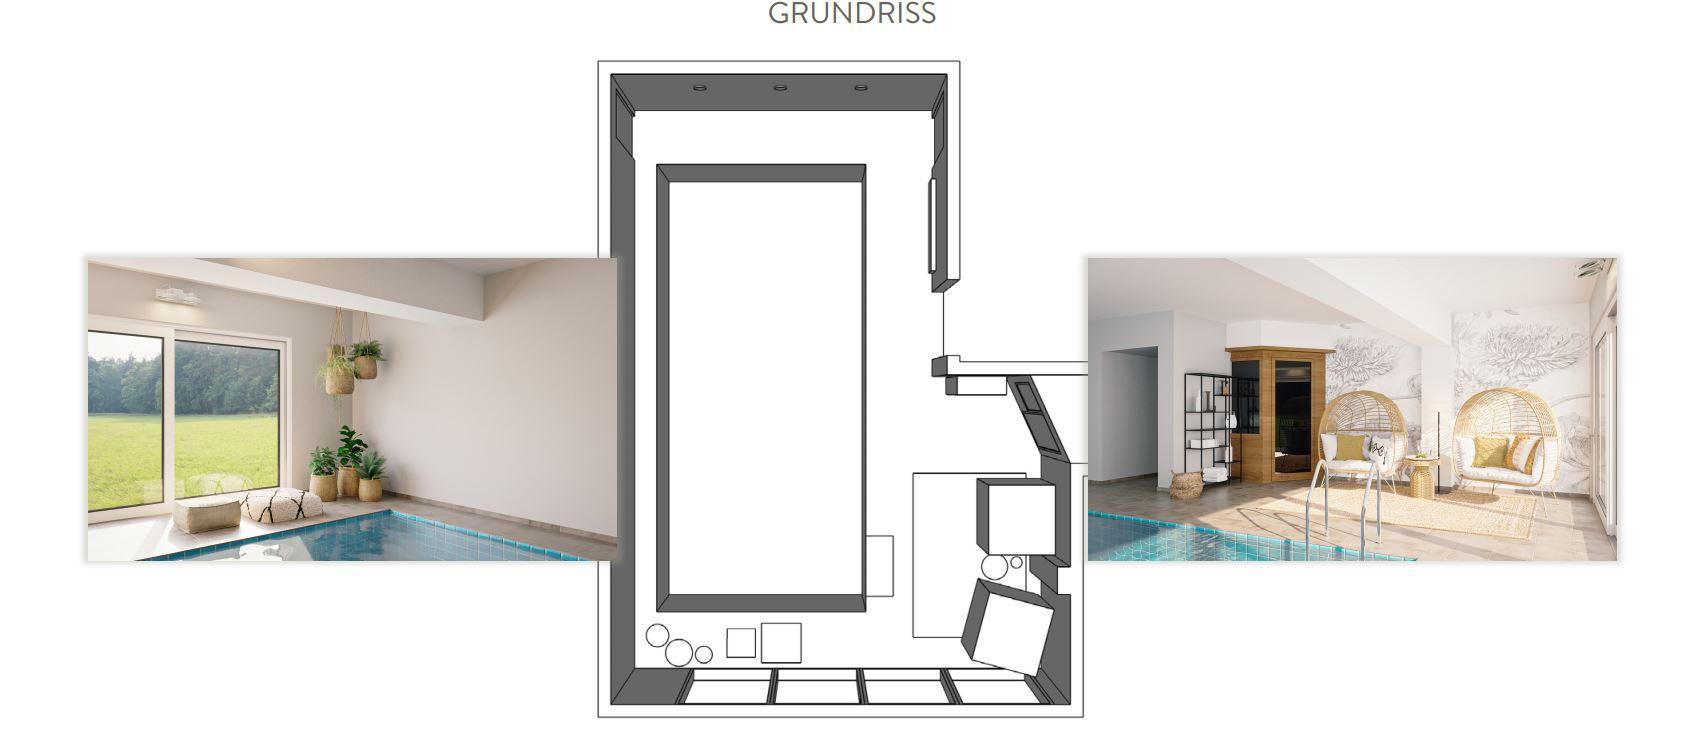 Poolgestaltung Grundriss